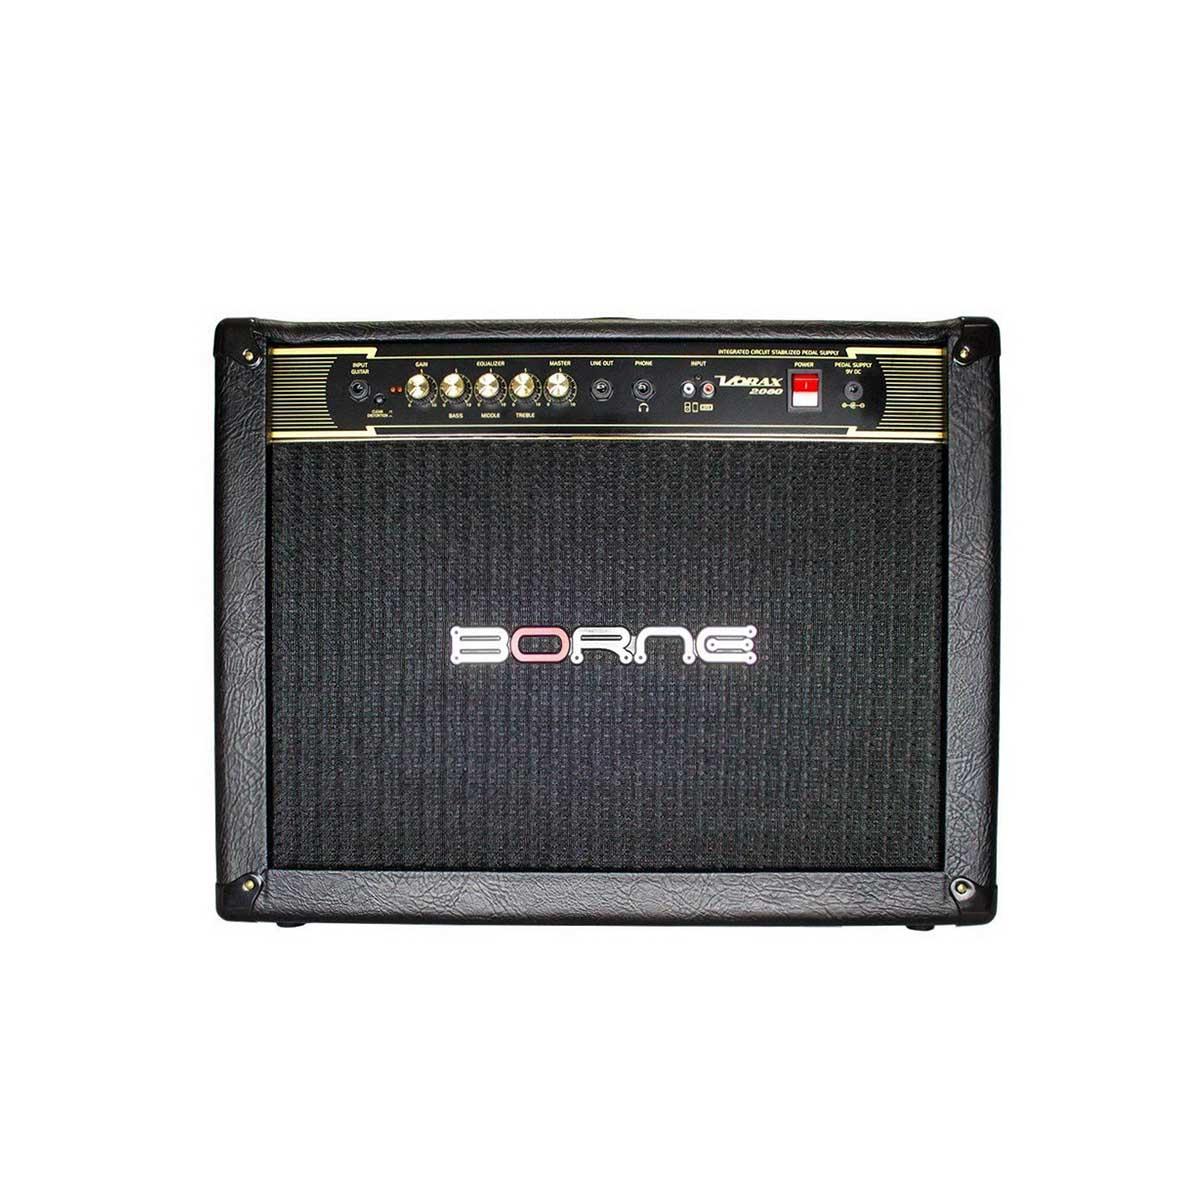 Caixa Amplificada Borne Vorax 2080 2x8 60w RMS para Guitarra